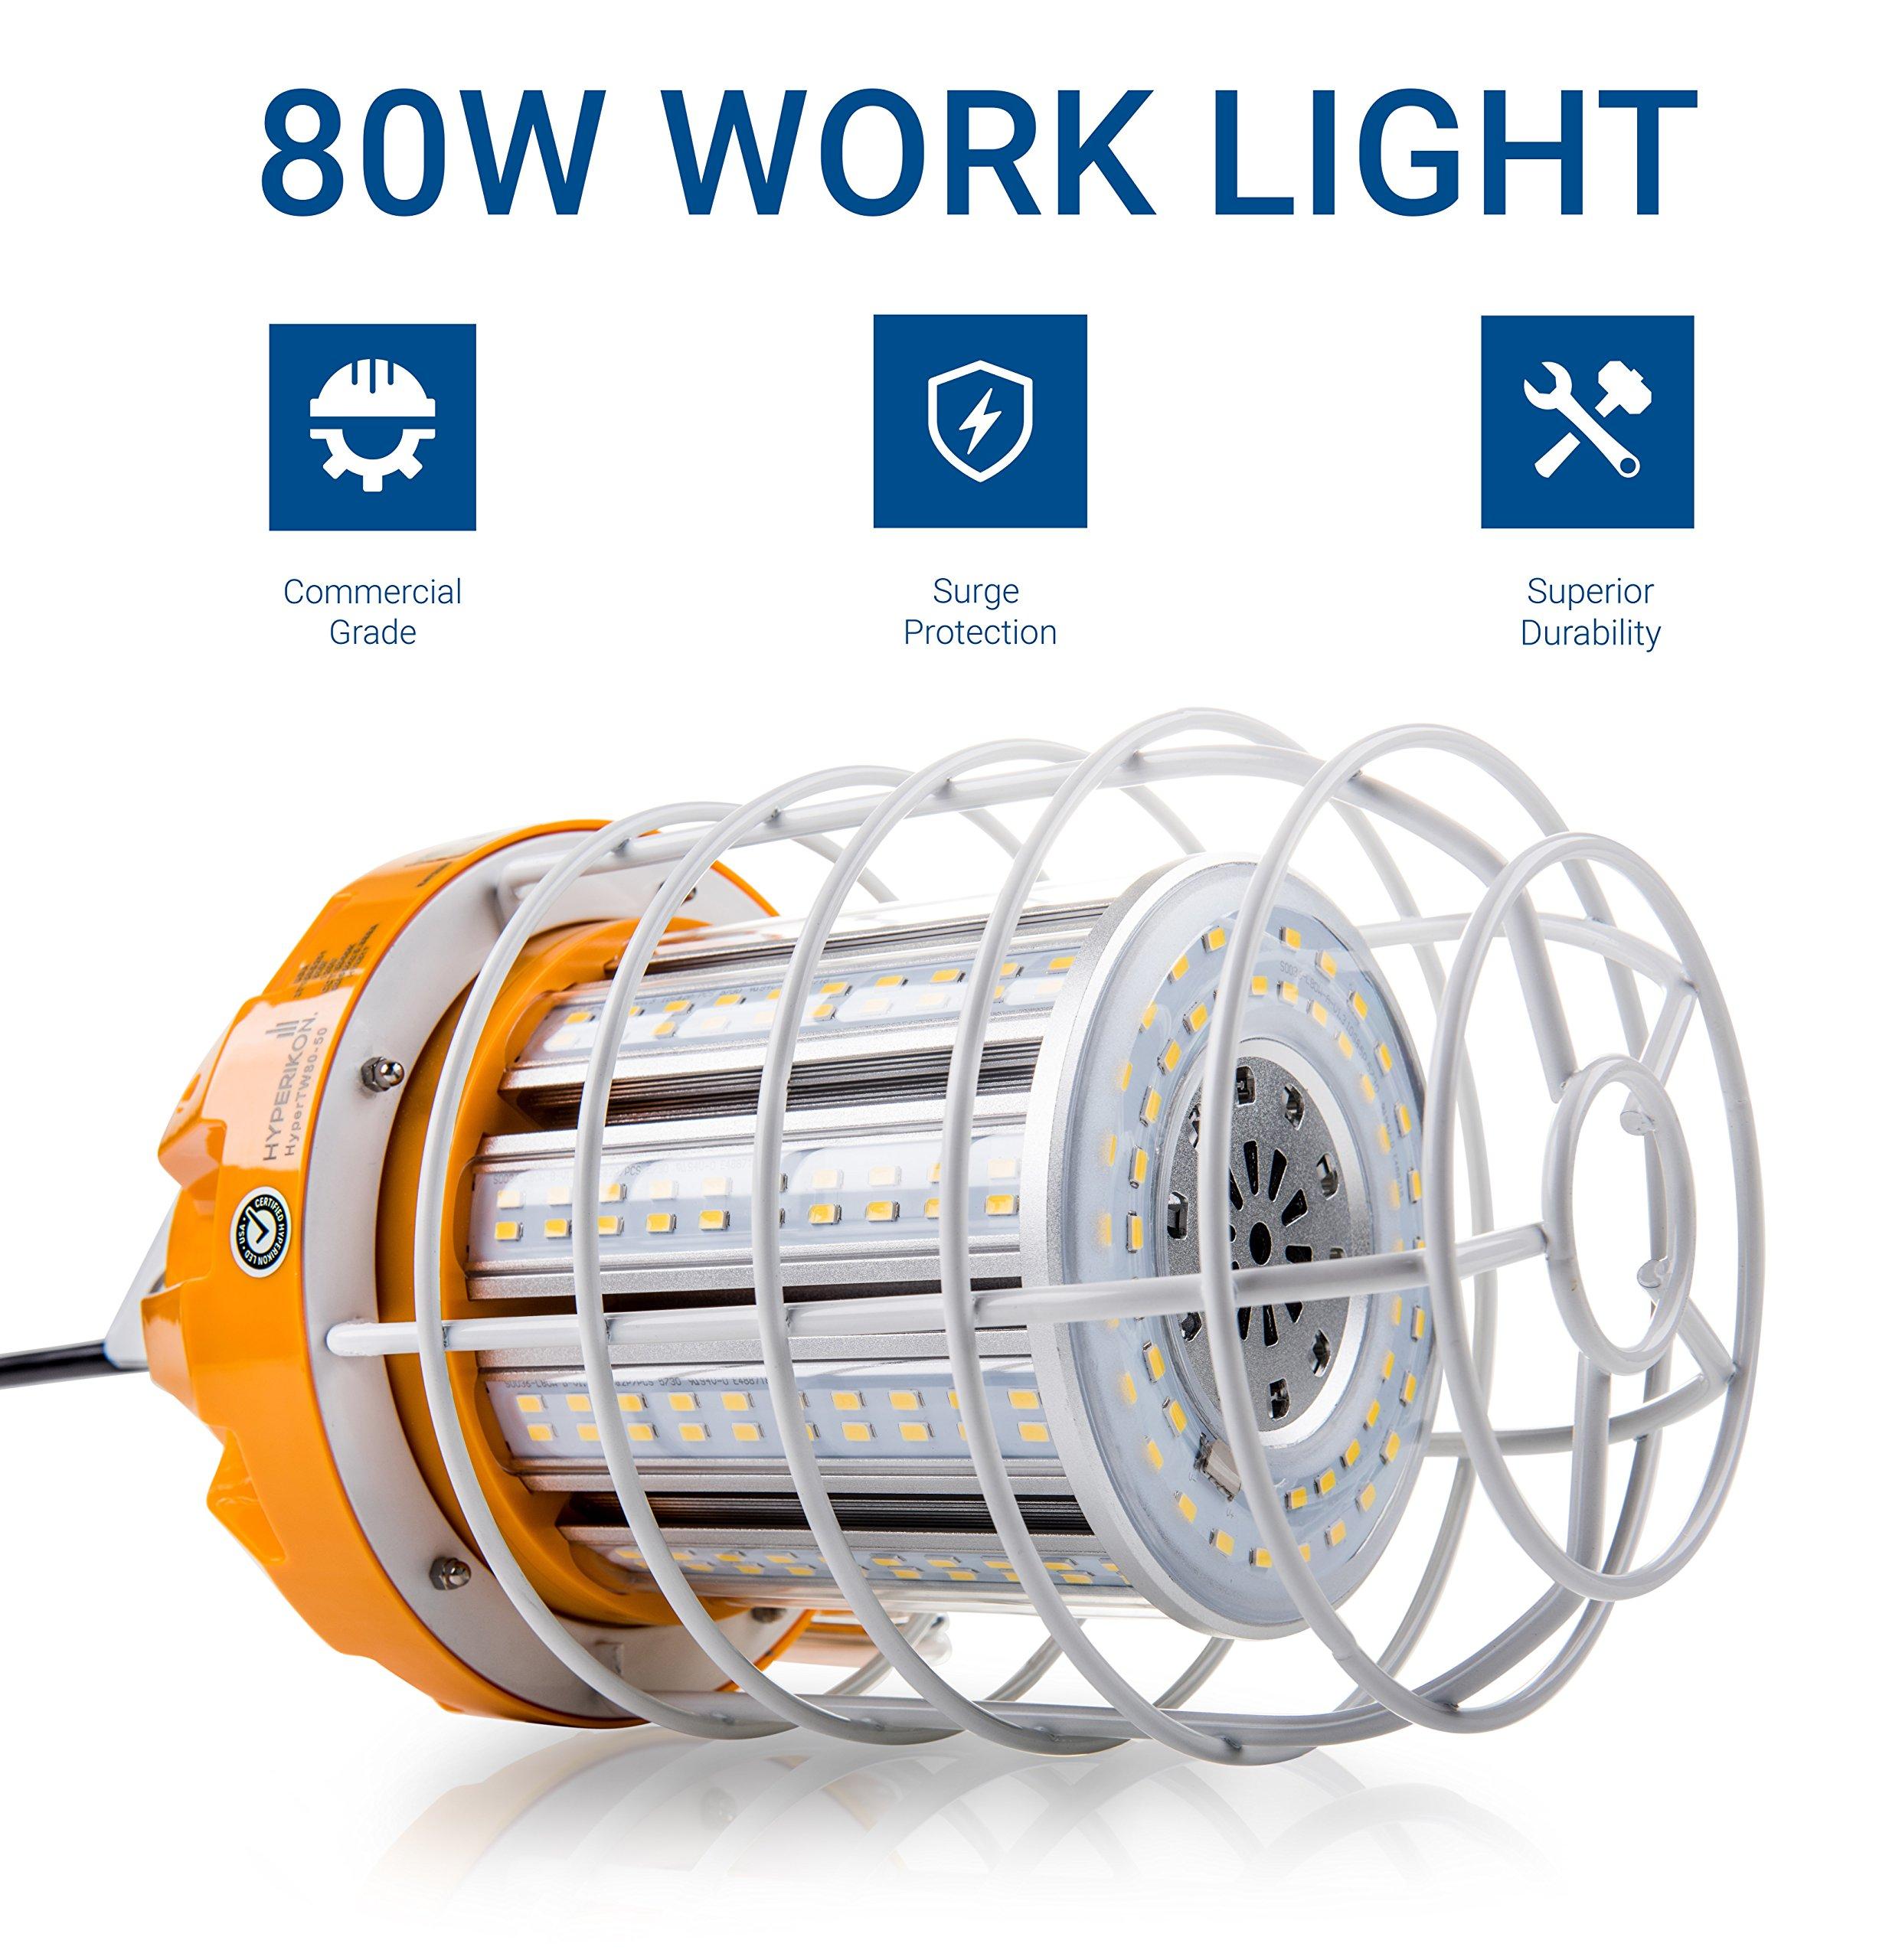 Hyperikon 80W LED Temporary Work Light Fixture, 9600 Lumens, Orange Construction Drop Light, LED High Bay Lighting, UL IP65 Waterproof, 5000K by Hyperikon (Image #2)